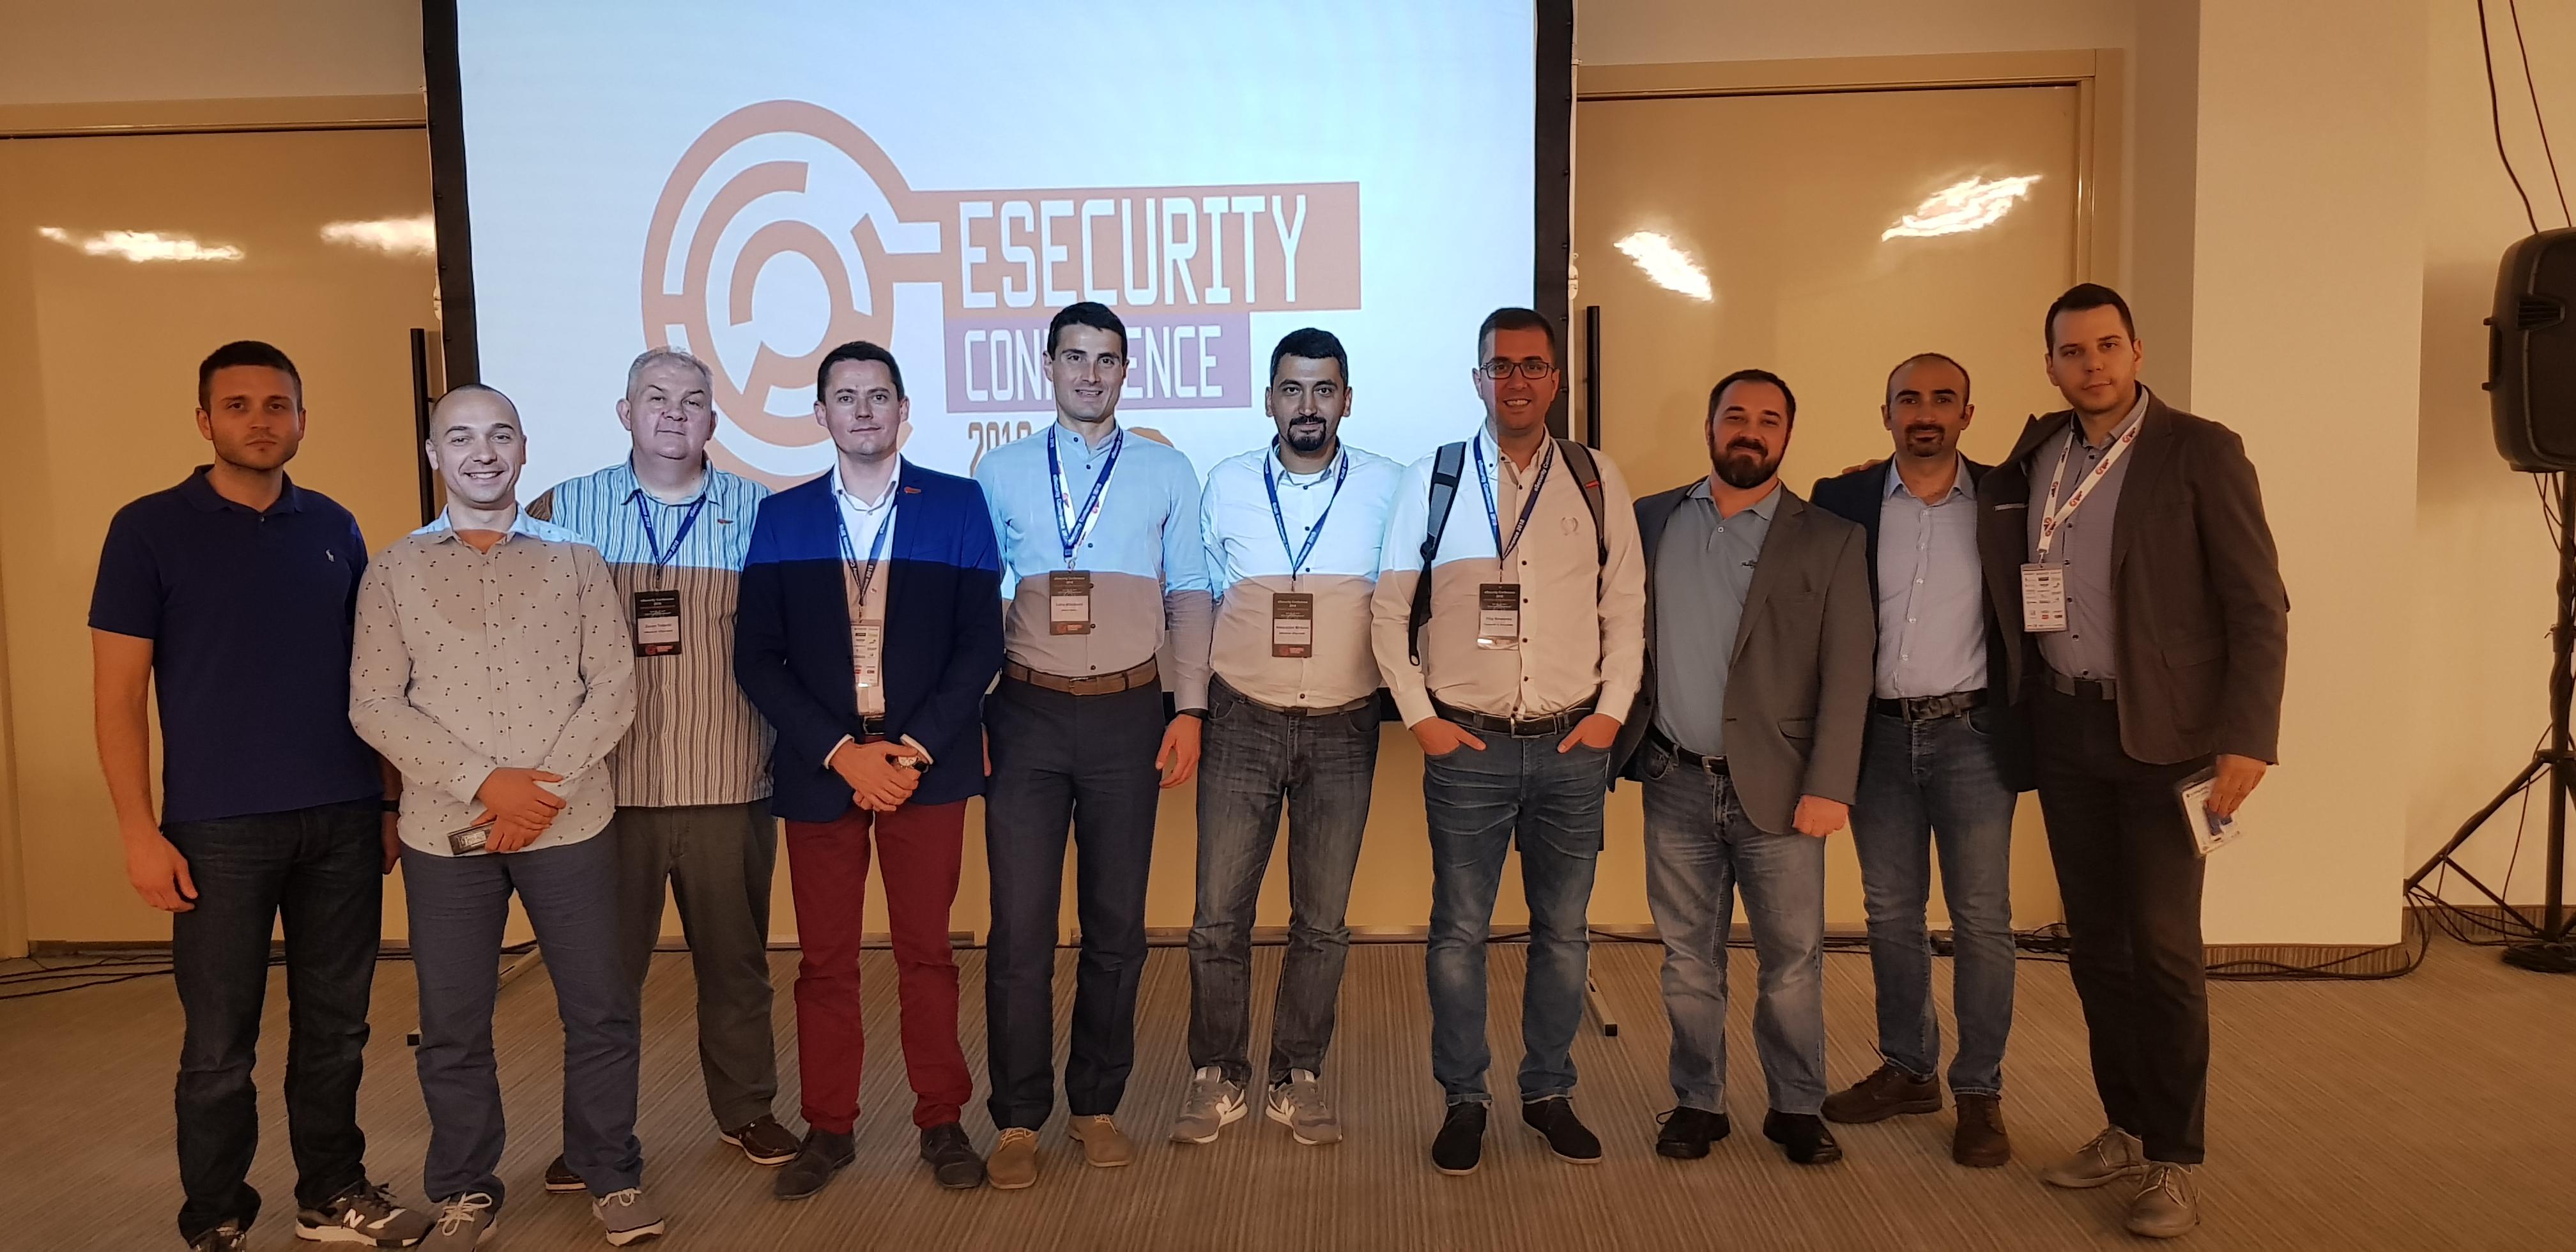 Održana  konferencija eSecurity 2018